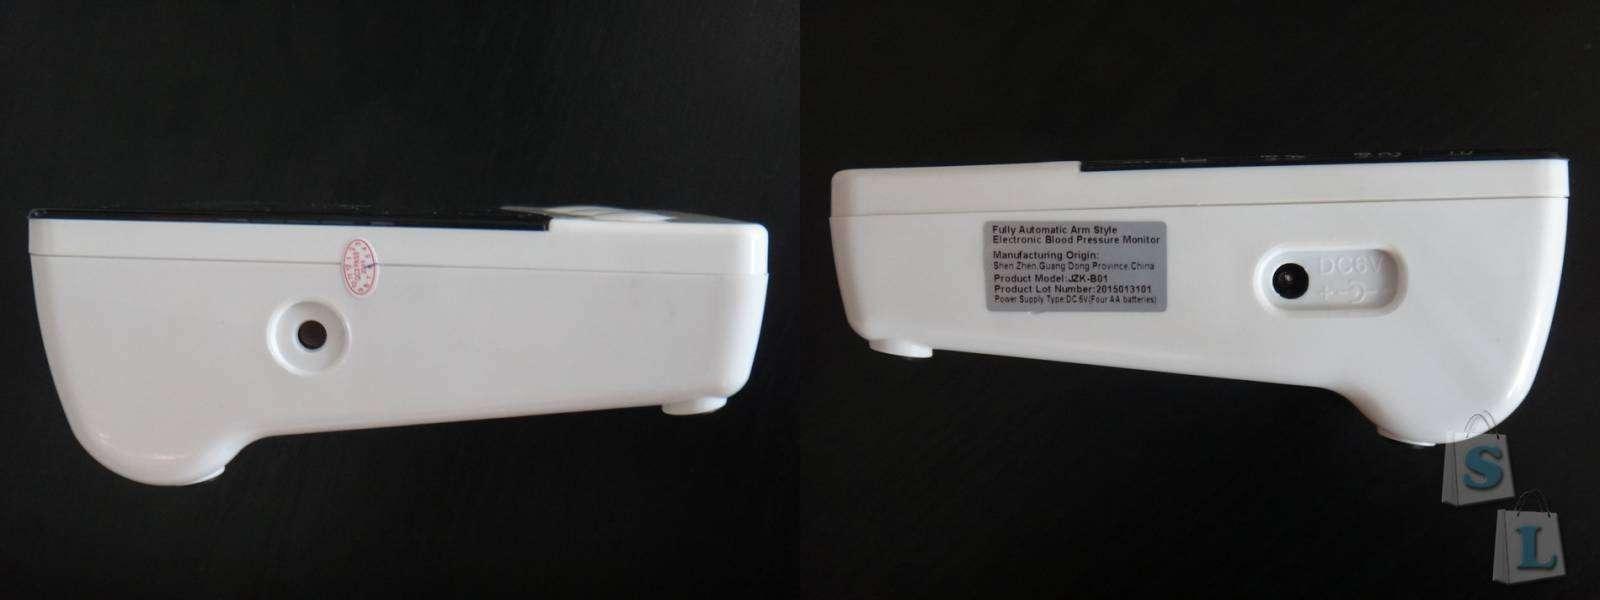 EachBuyer: Автоматический электронный тонометр обзор Automatic Arm Type Intelligent Electronic Sphygmomanometer